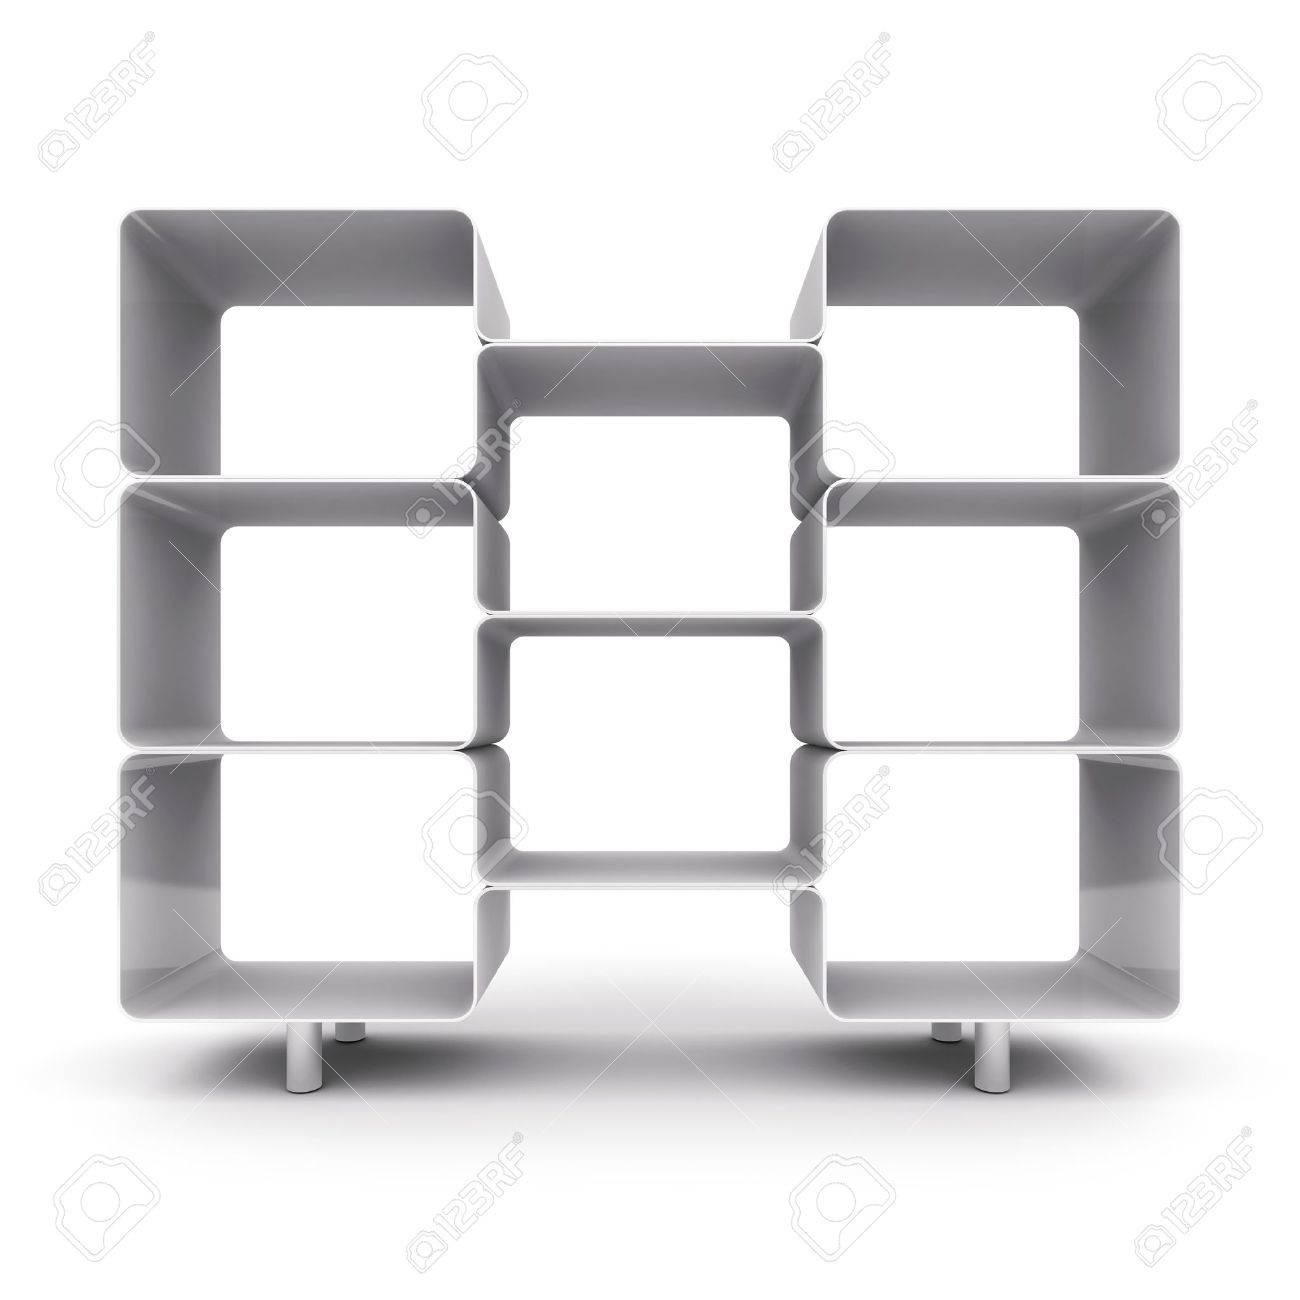 Realistic 3d illustration of modern wooden bookshelf against ston - Three Shelves Empty Shelves For Your Content 3d Illustration